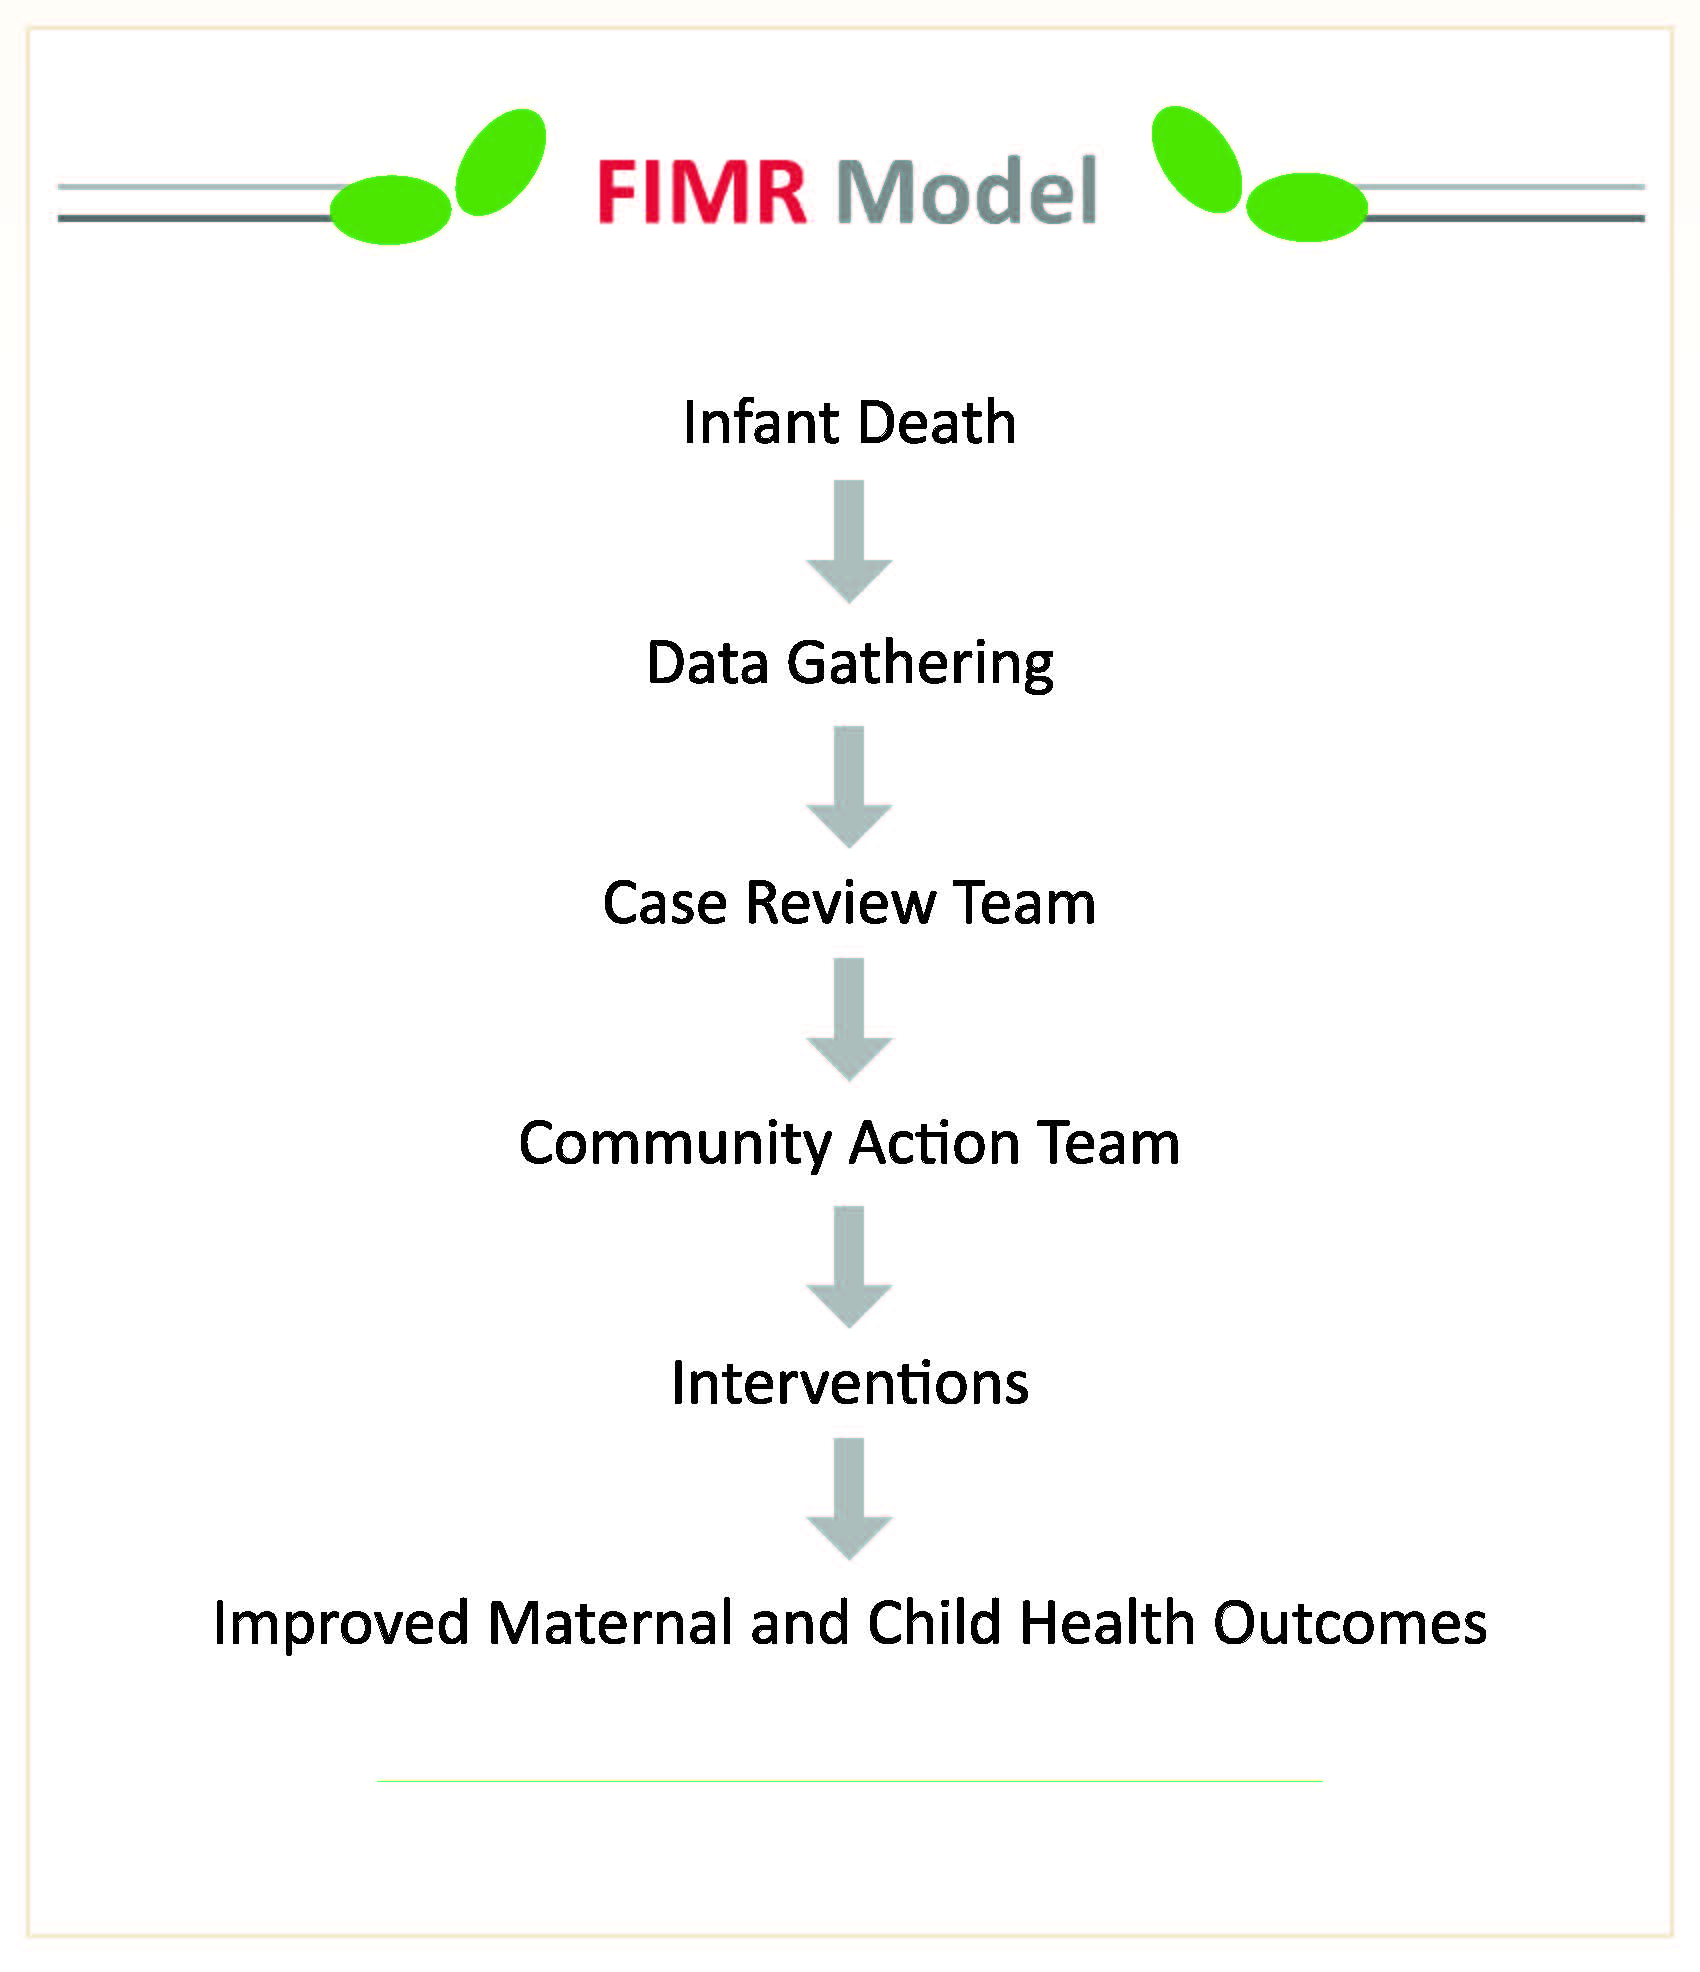 FIMR Model